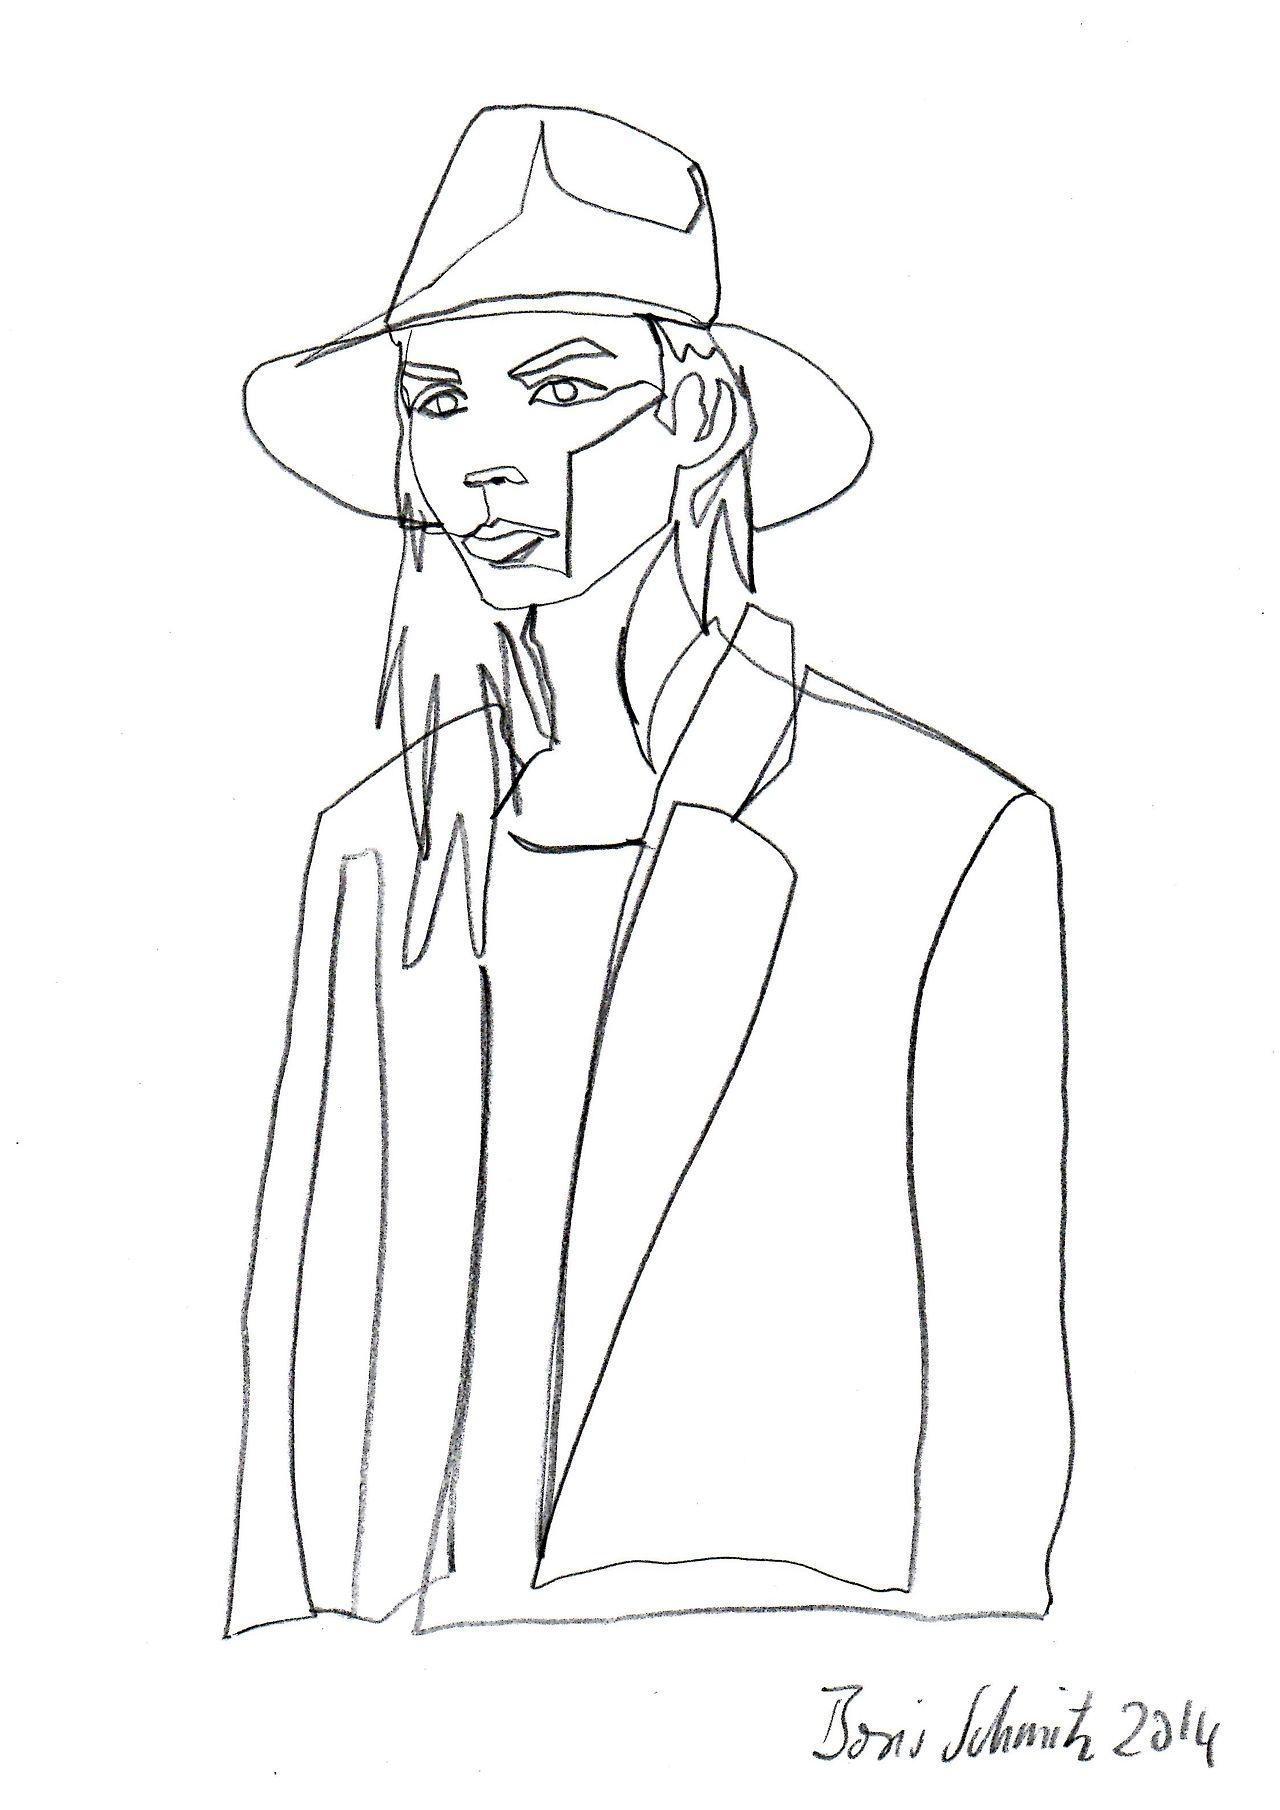 Boris schmitz portfolio sketch in 2018 pinterest for Art of minimal boris